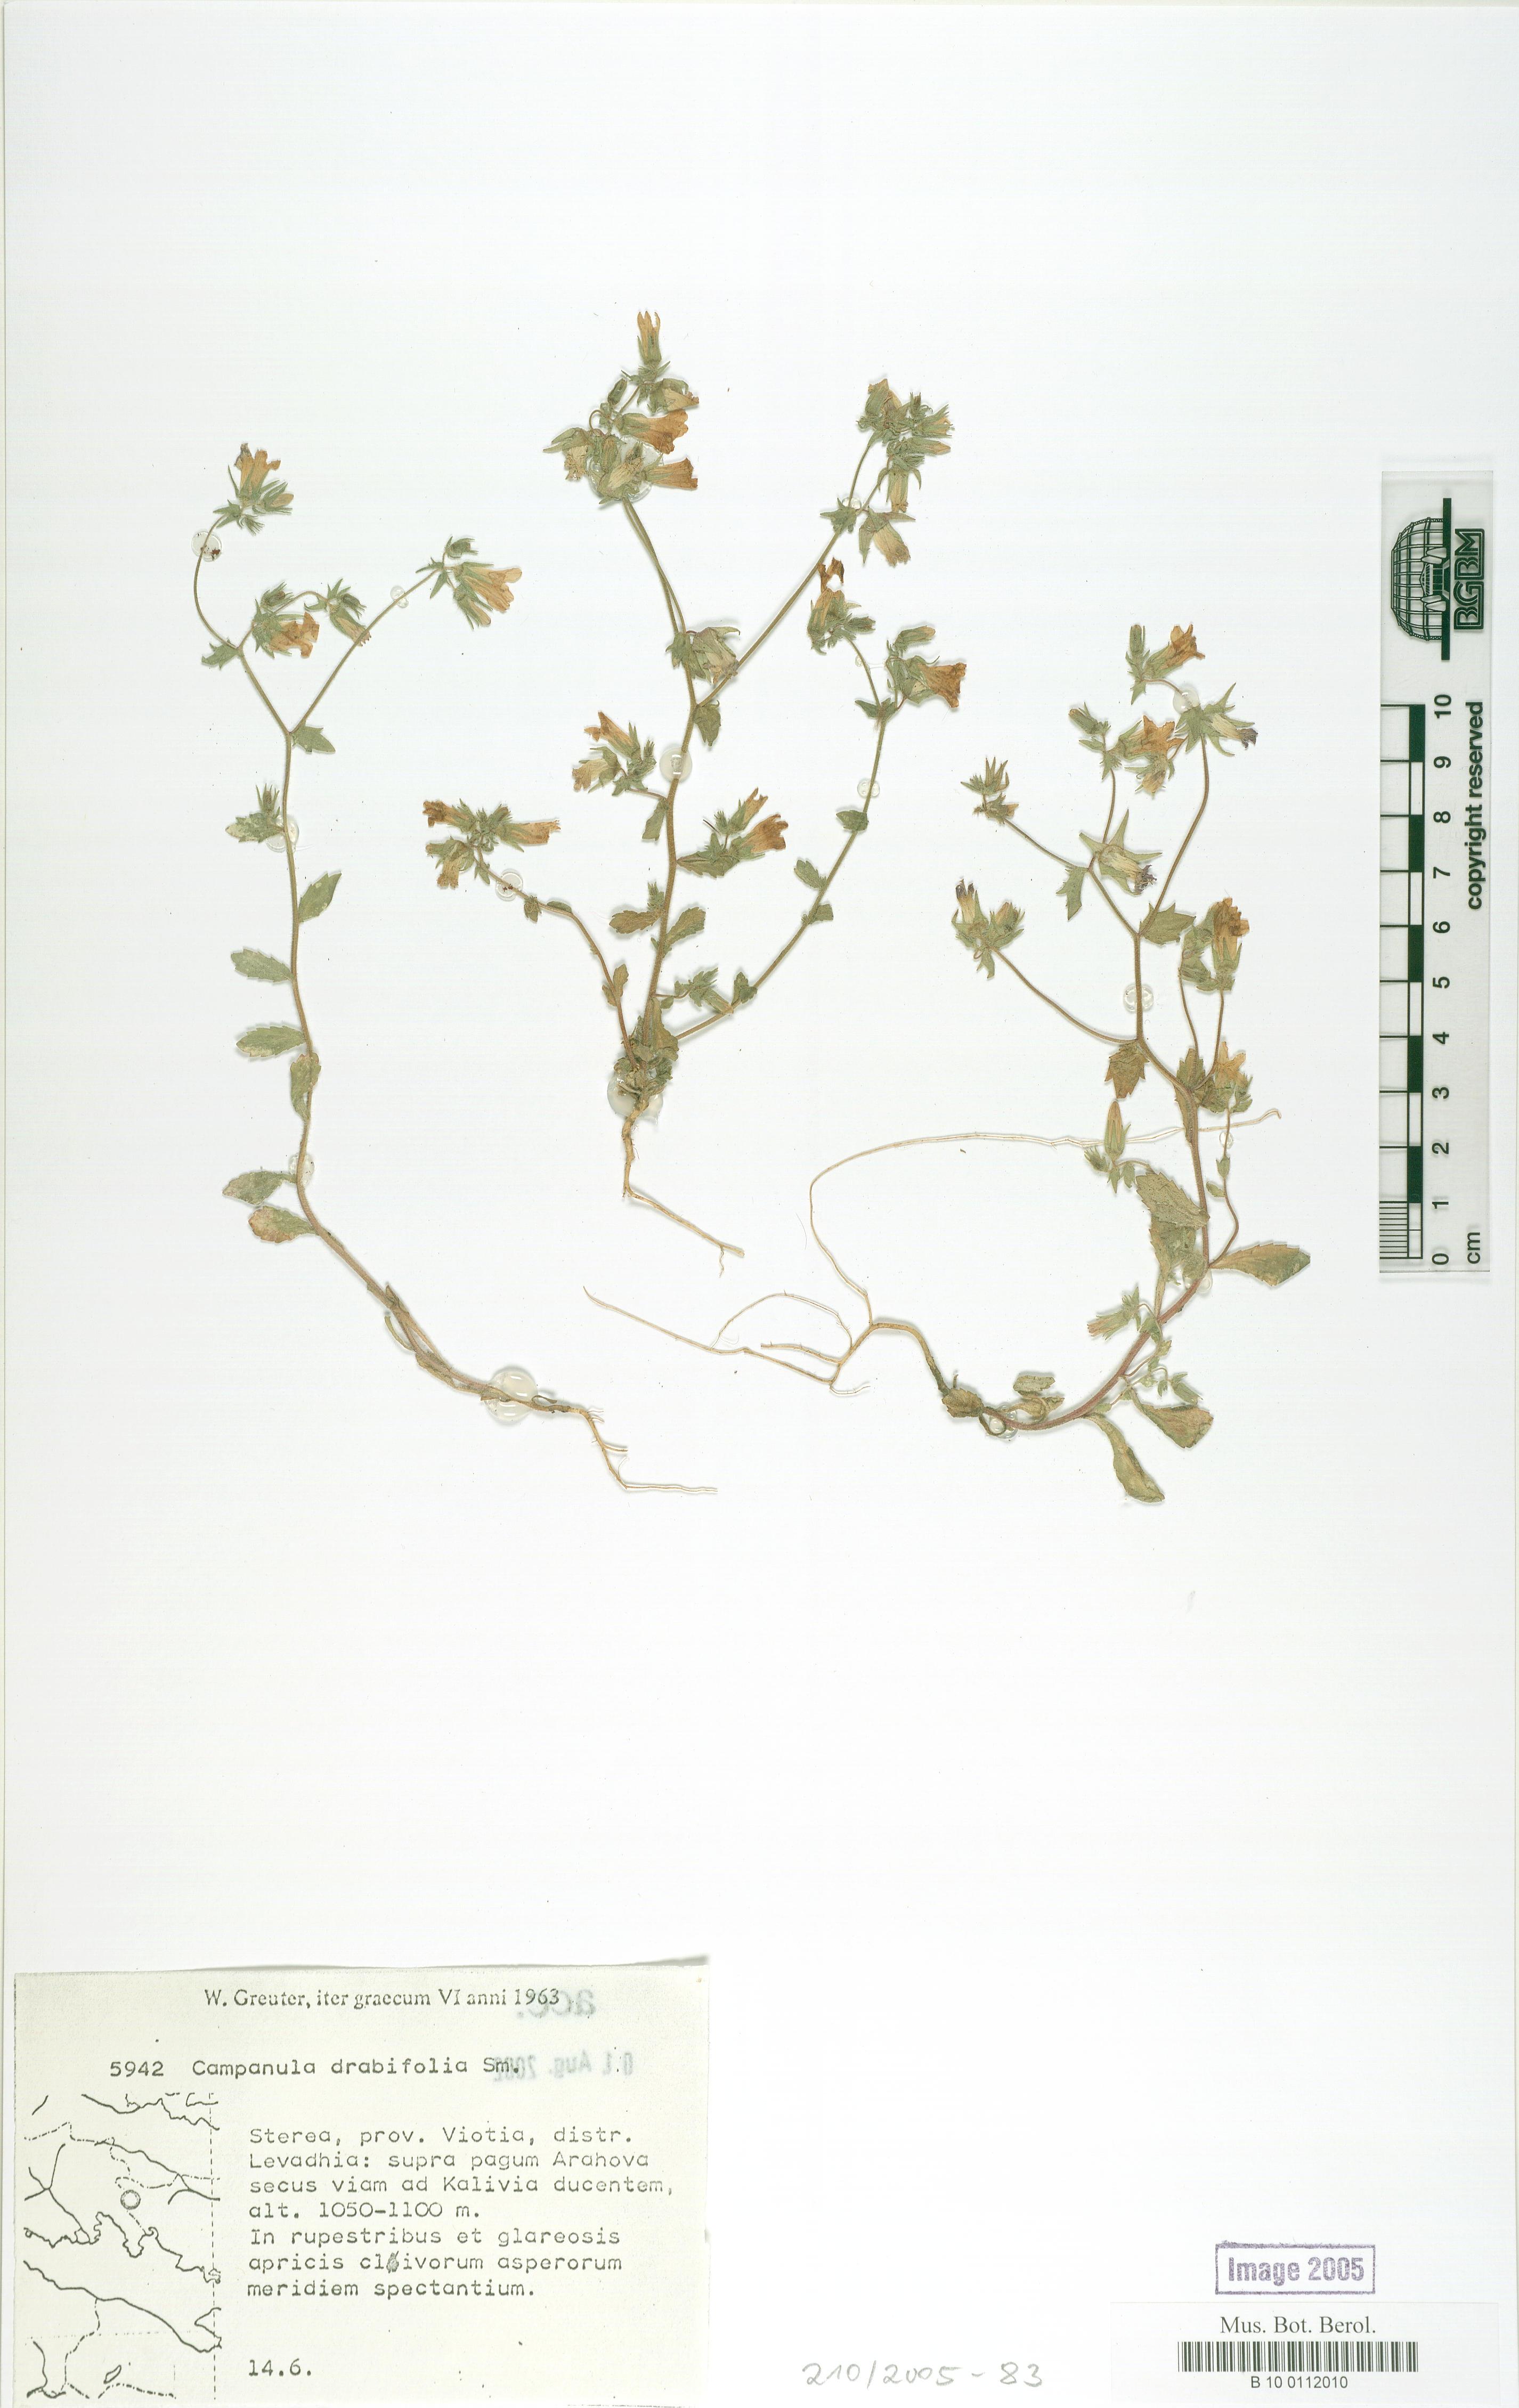 http://ww2.bgbm.org/herbarium/images/B/10/01/12/01/B_10_0112010.jpg